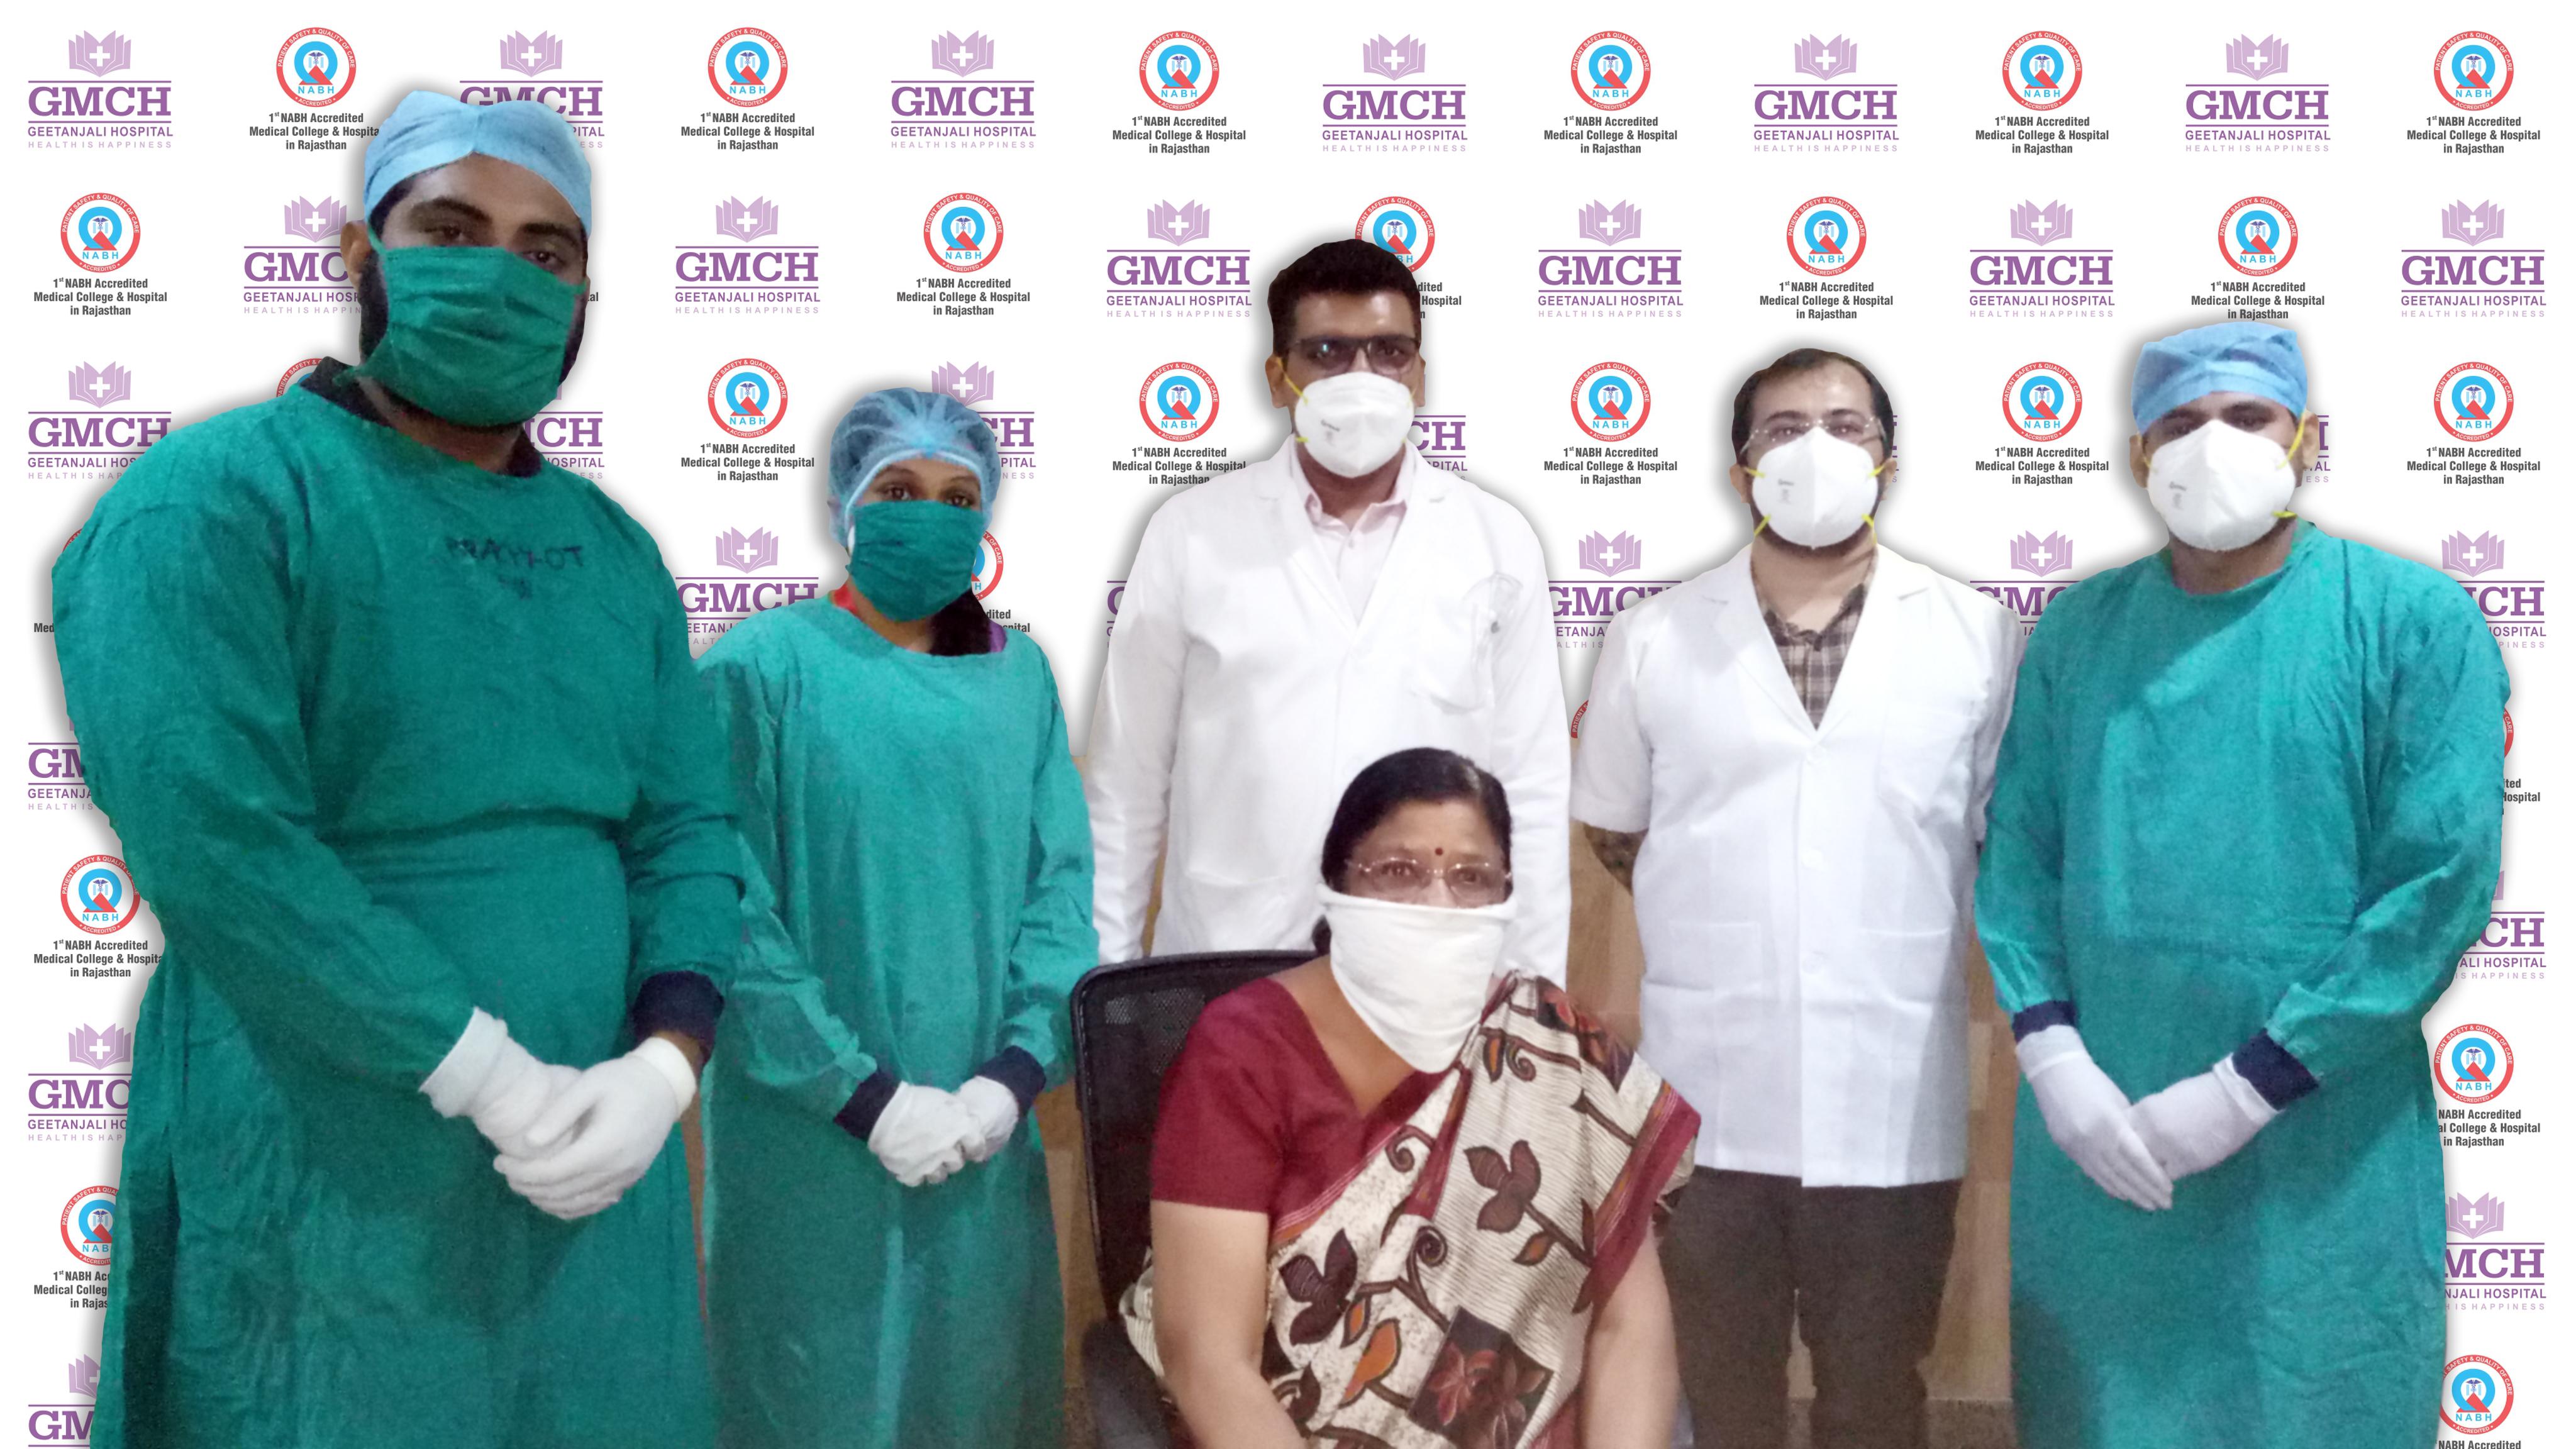 GMCH: उन्नत पद्धति त्वरित आंशिक स्तन विकिरण (एपीबीआई) द्वारा रोगी का हुआ सफल इलाज